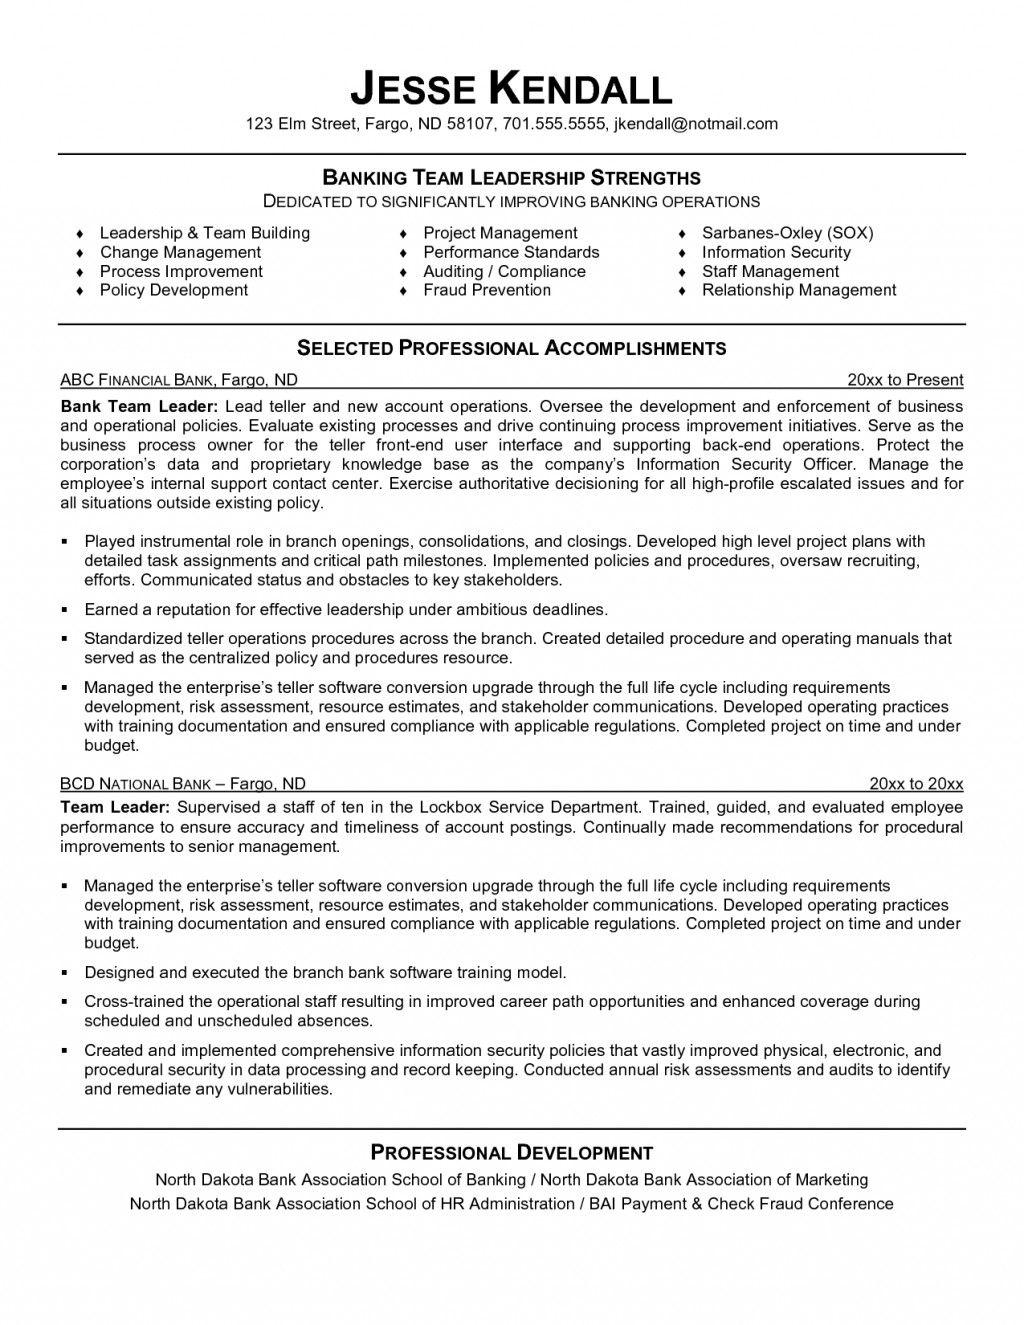 Resume Examples Leadership Skills Resume Templates Bank Teller Resume Resume Skills Good Resume Examples